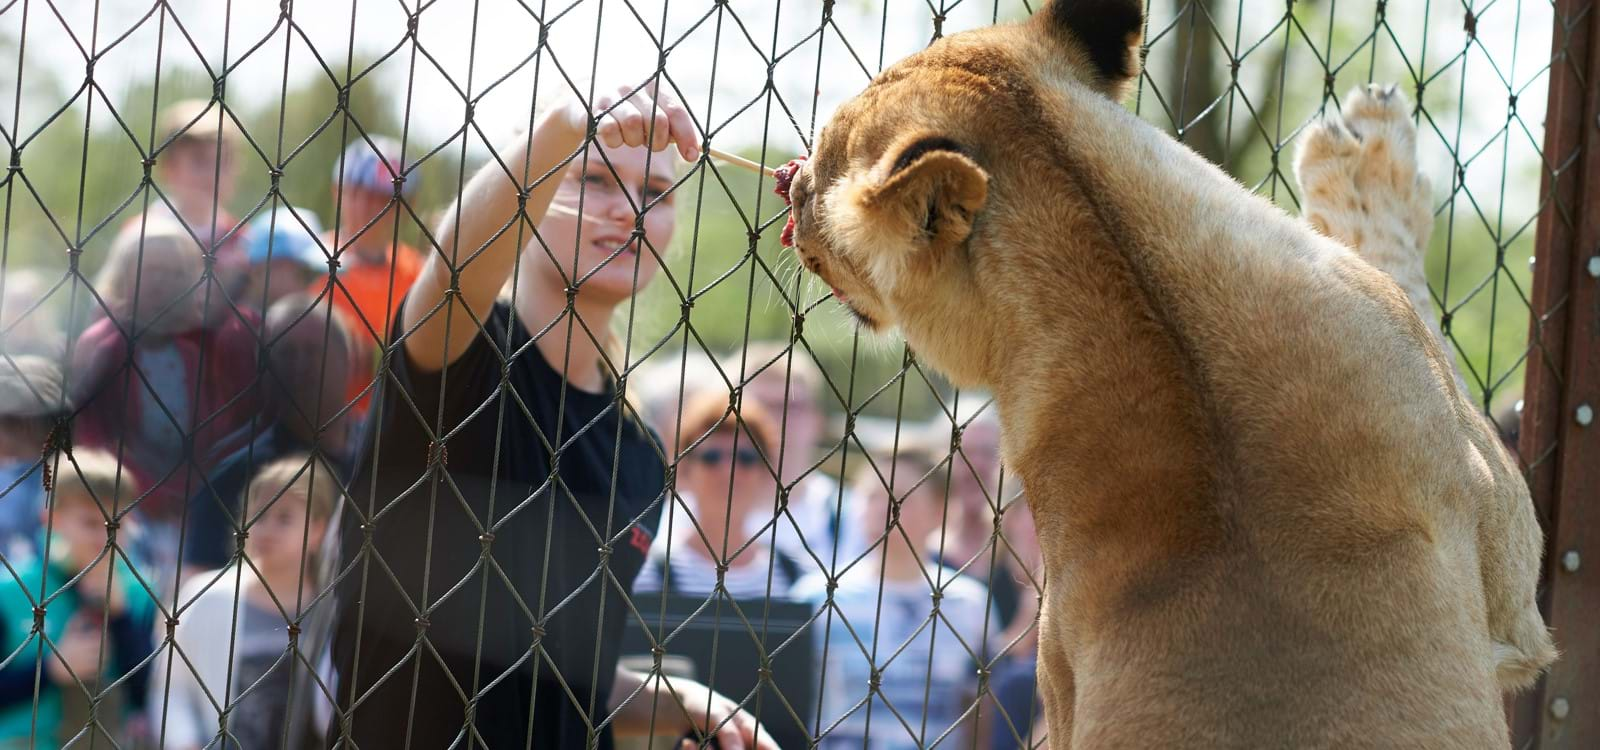 odense zoo kort escortfuide